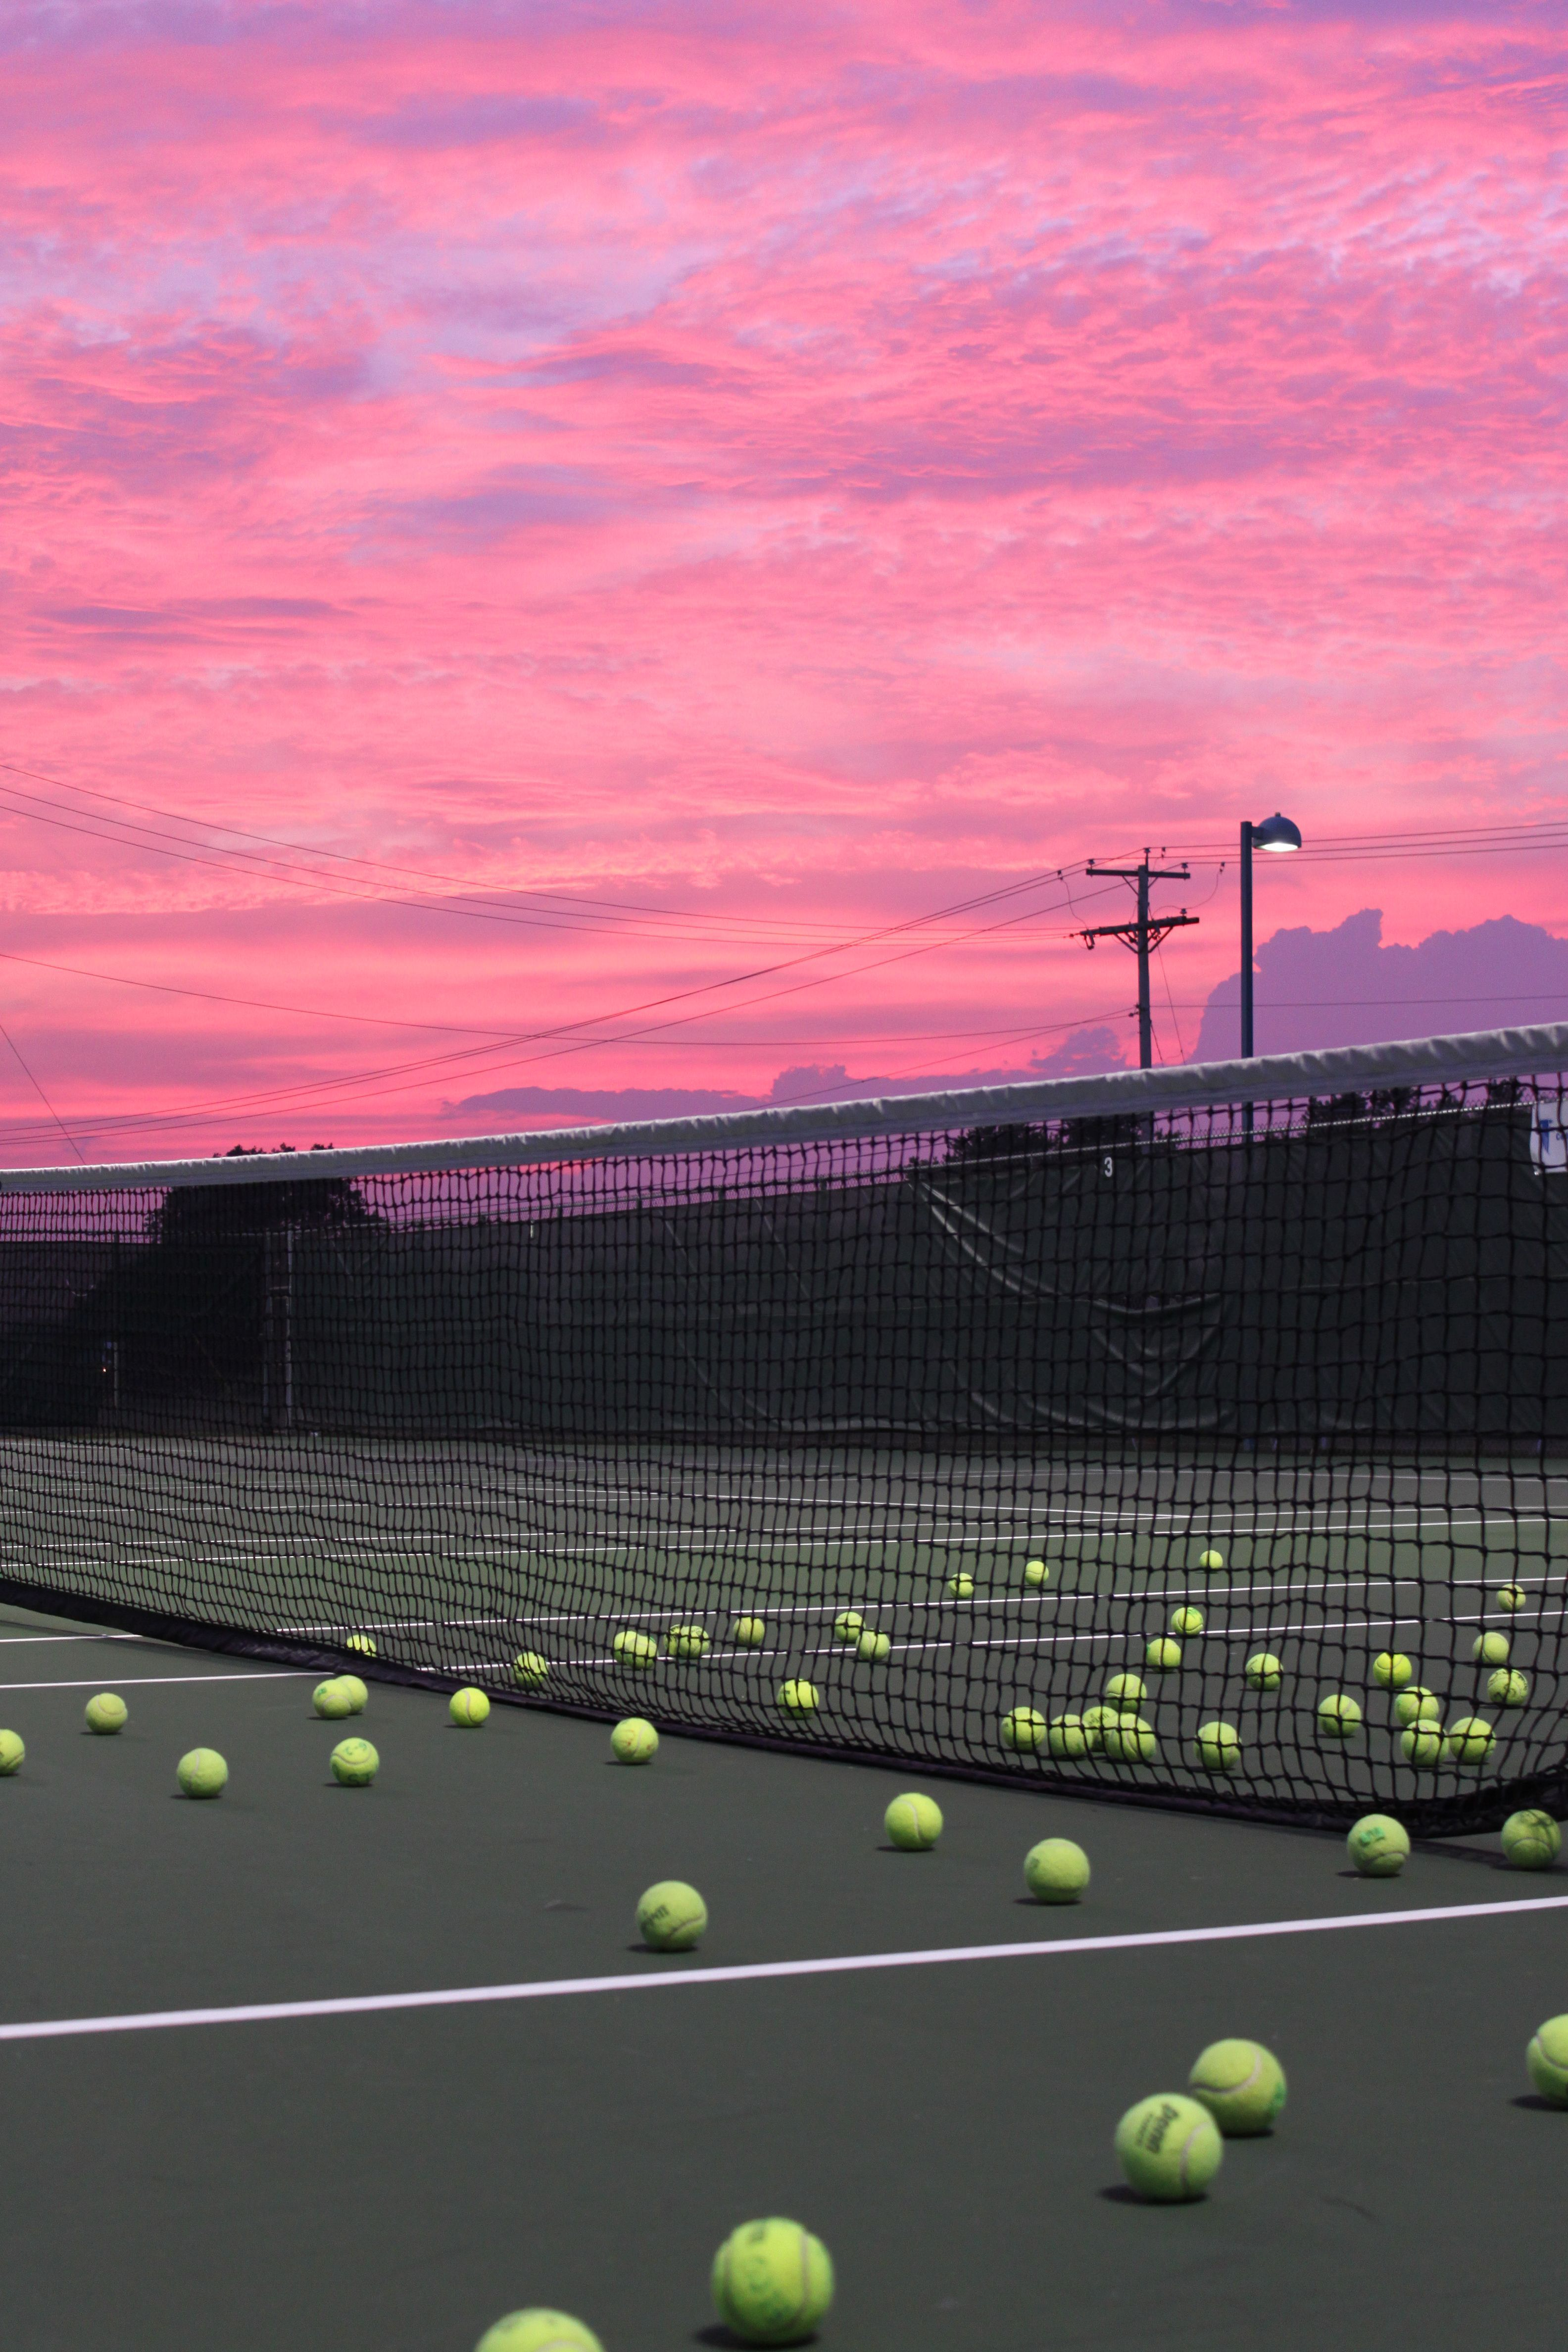 Hold My Tennis Racket Art Print By Hanna Kastl Lungberg Society6 Tennis Racket Art Tennis Racket Tennis